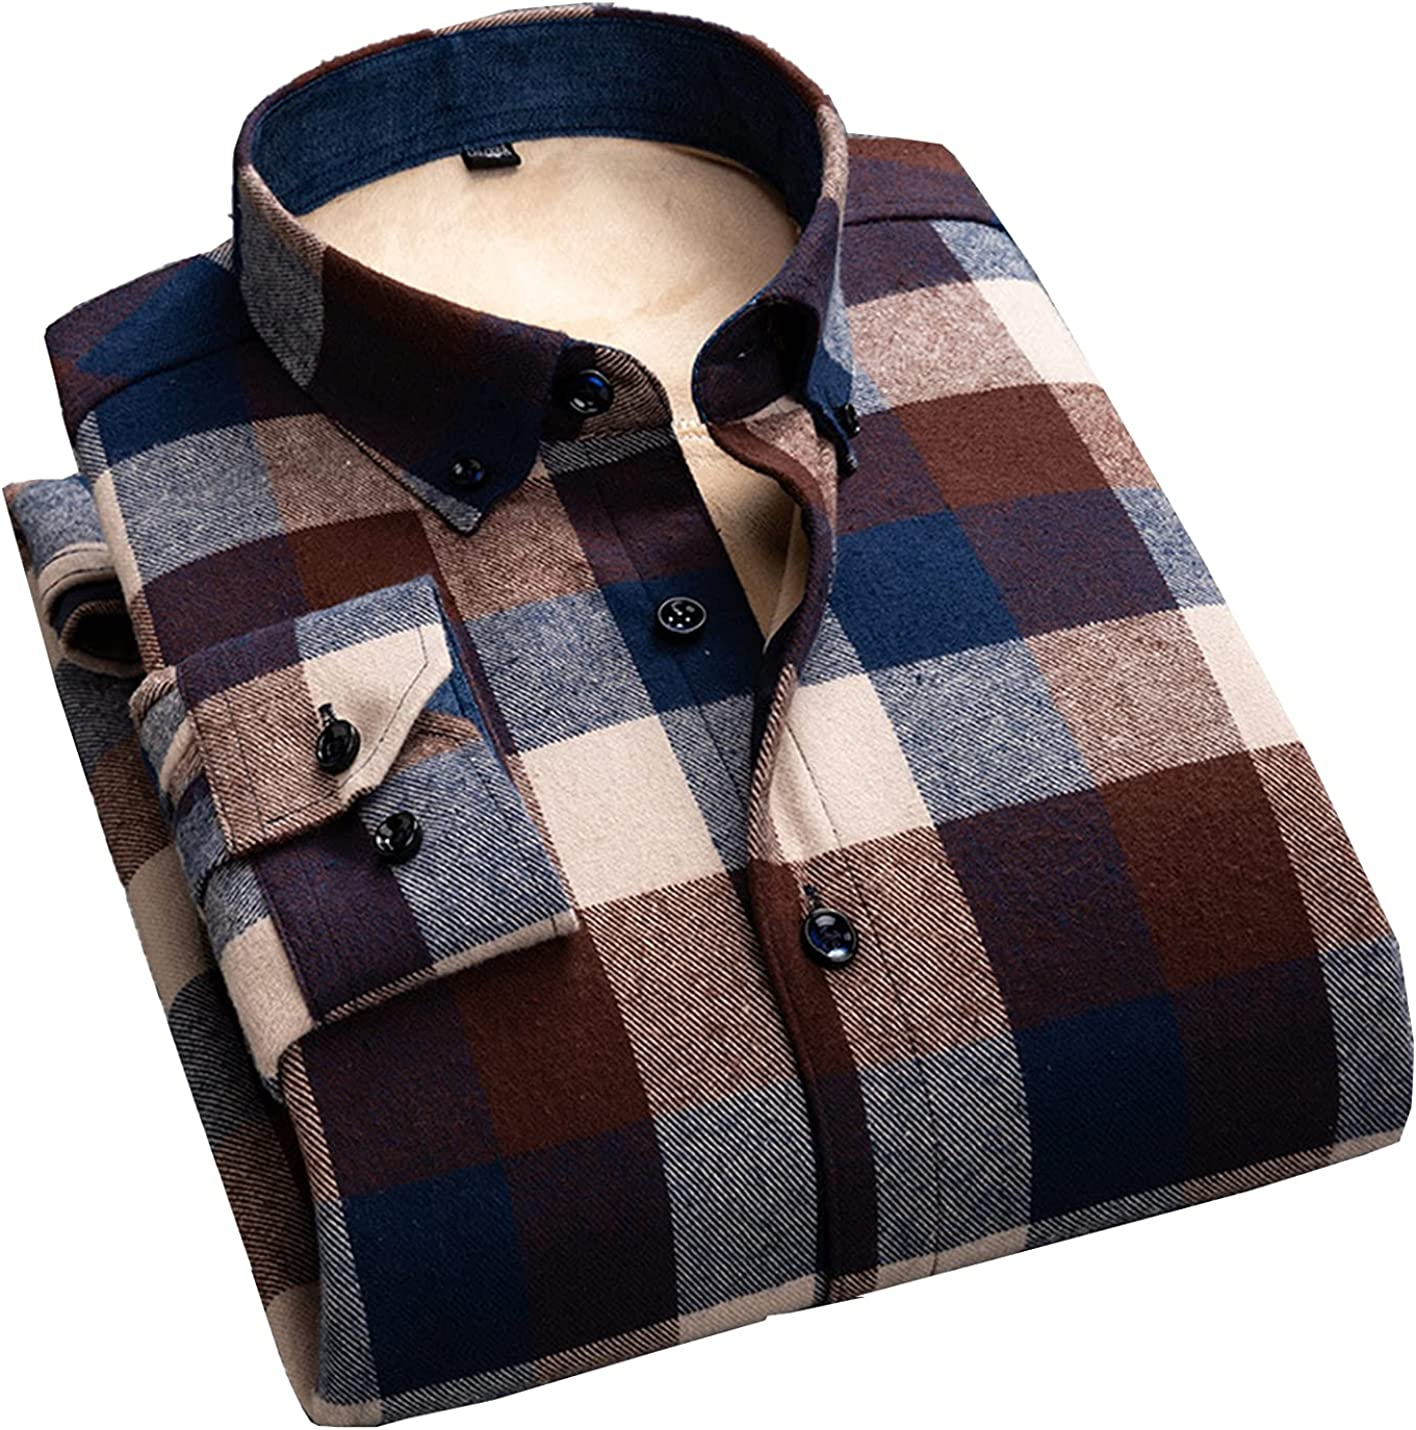 PEHMEA Men's Max 48% OFF Long Sleeve Fleece Sherpa Plaid Cheap Warm Lined Th Shirt